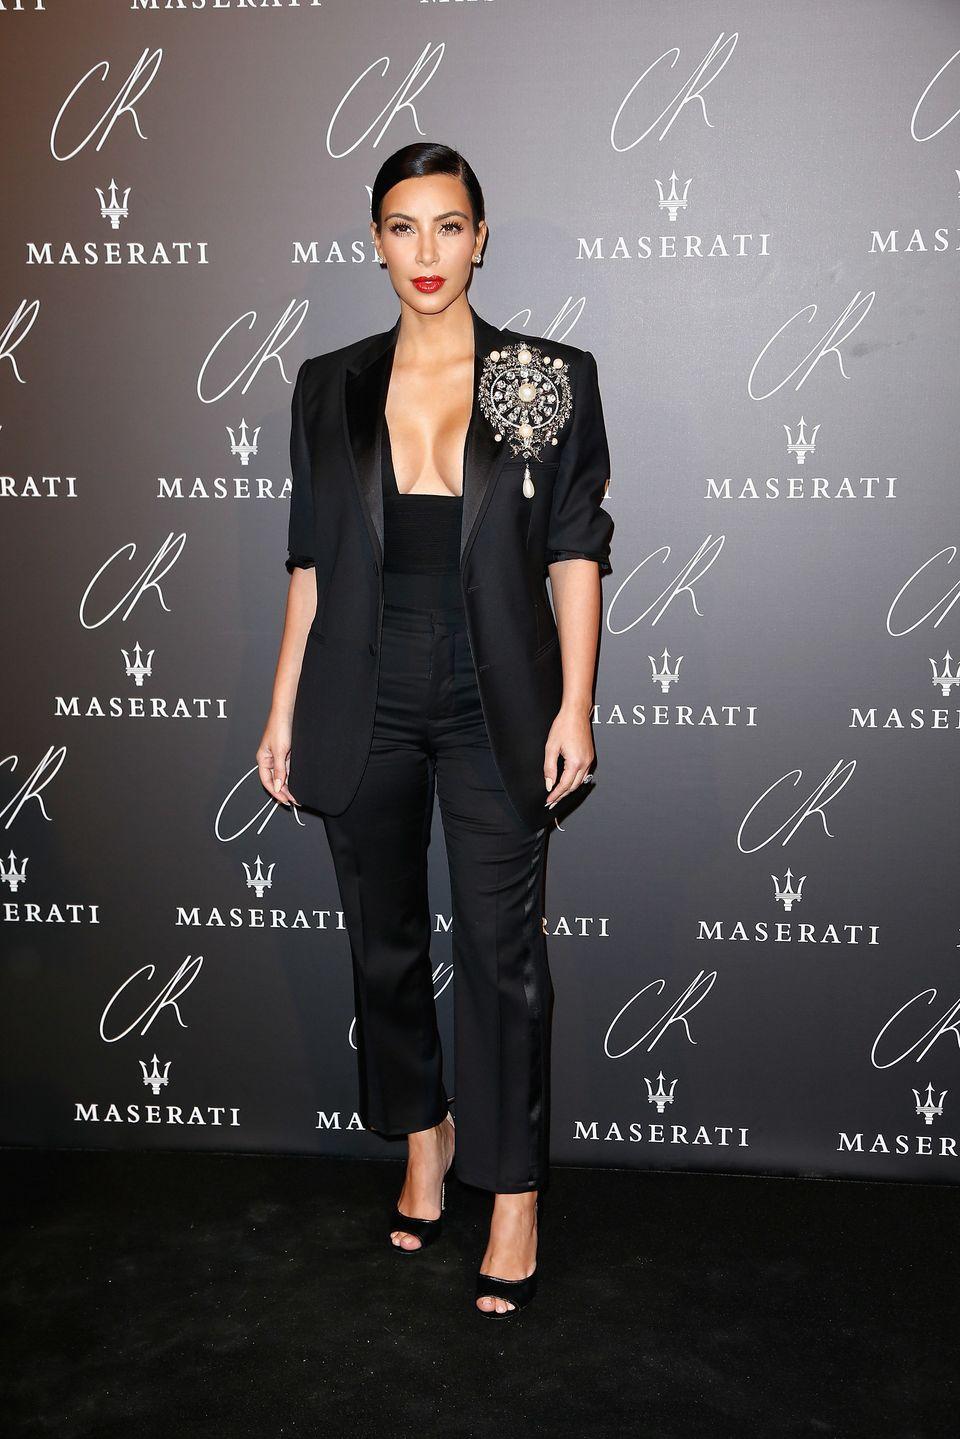 PARIS, FRANCE - SEPTEMBER 30:  Kim Kardashian attends CR Fashion Book Issue N°5 : Launch Party as part of the Paris Fashion